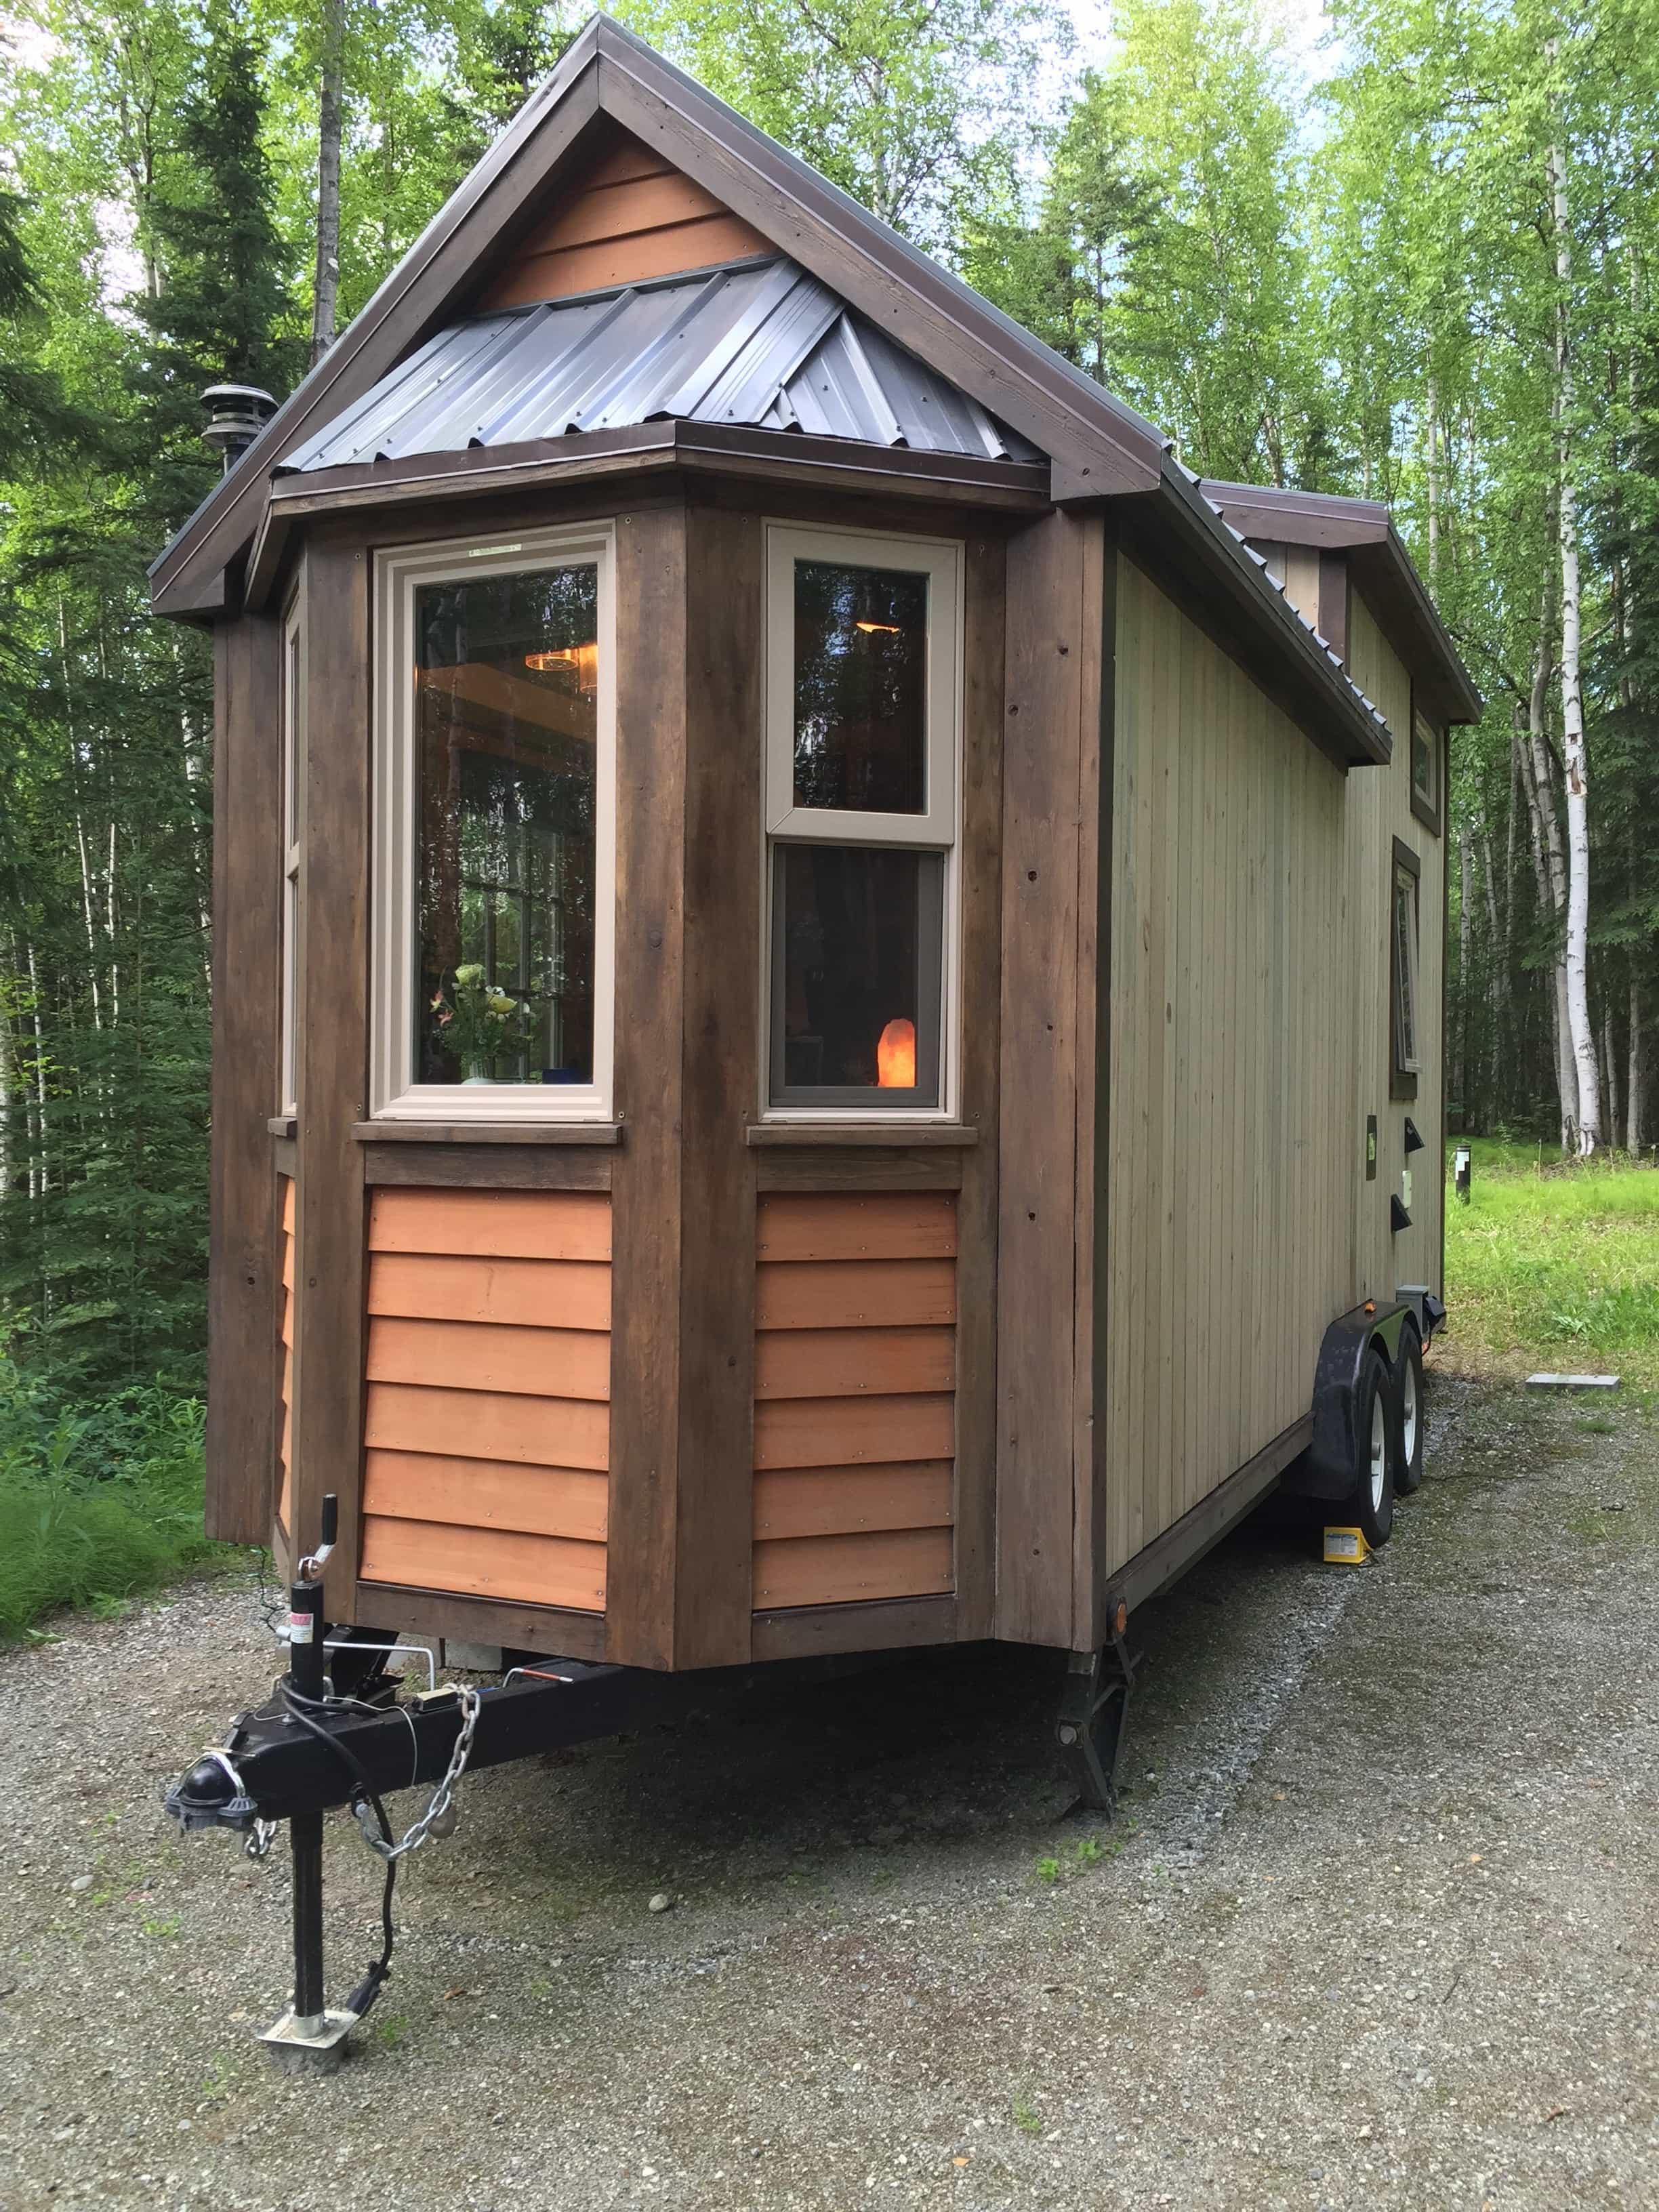 Tiny house on wheels in Alaska Tiny House for Us